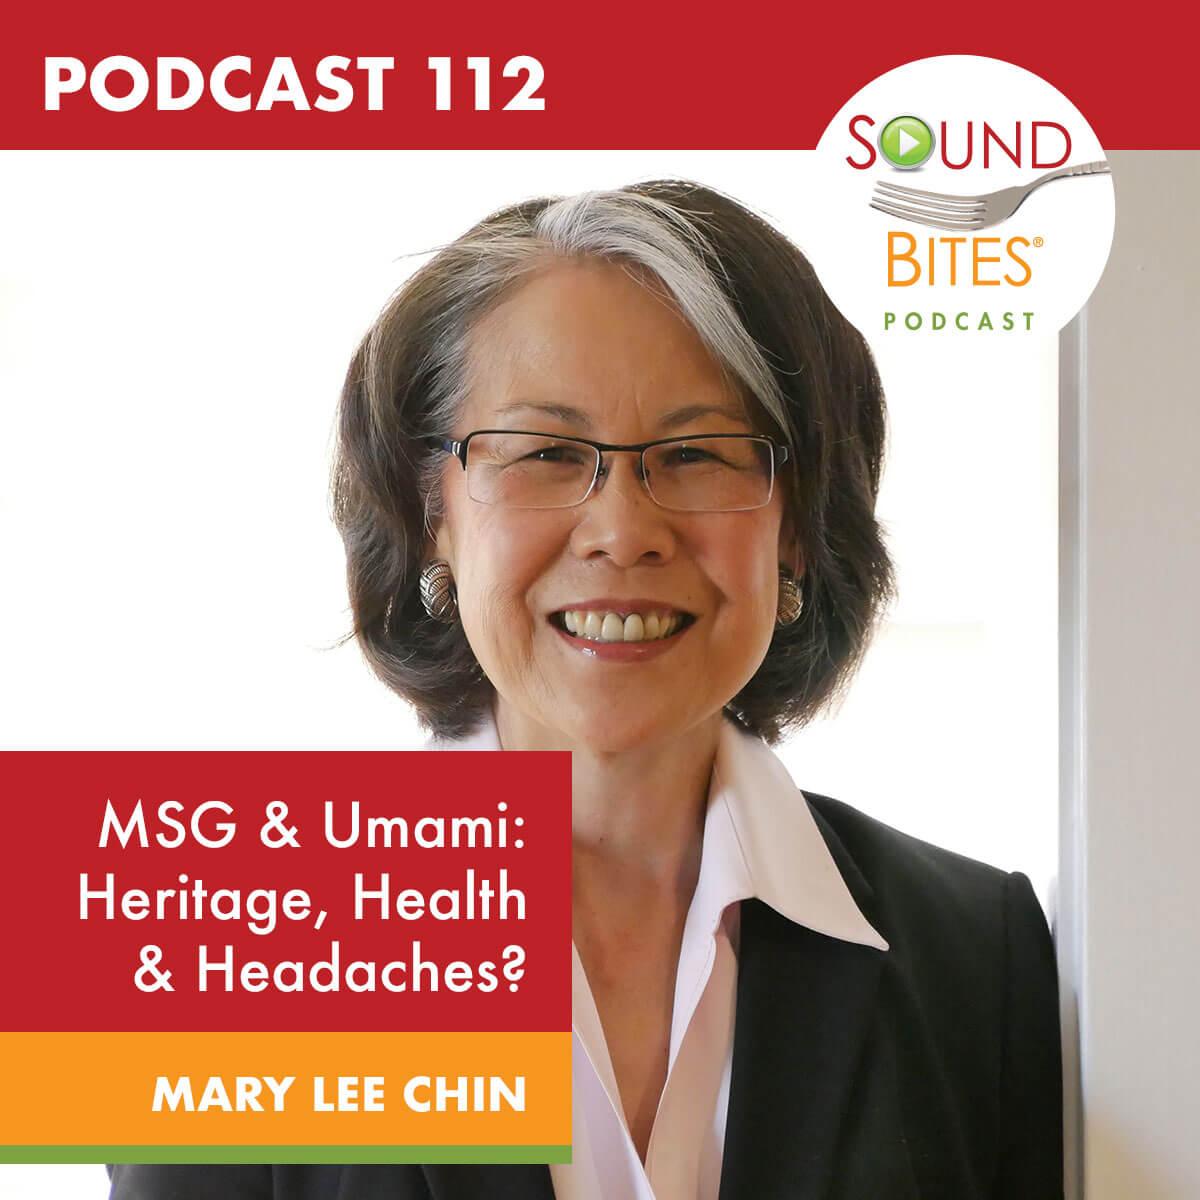 Podcast 112: MSG & Umami: Heritage, Health & Headaches?